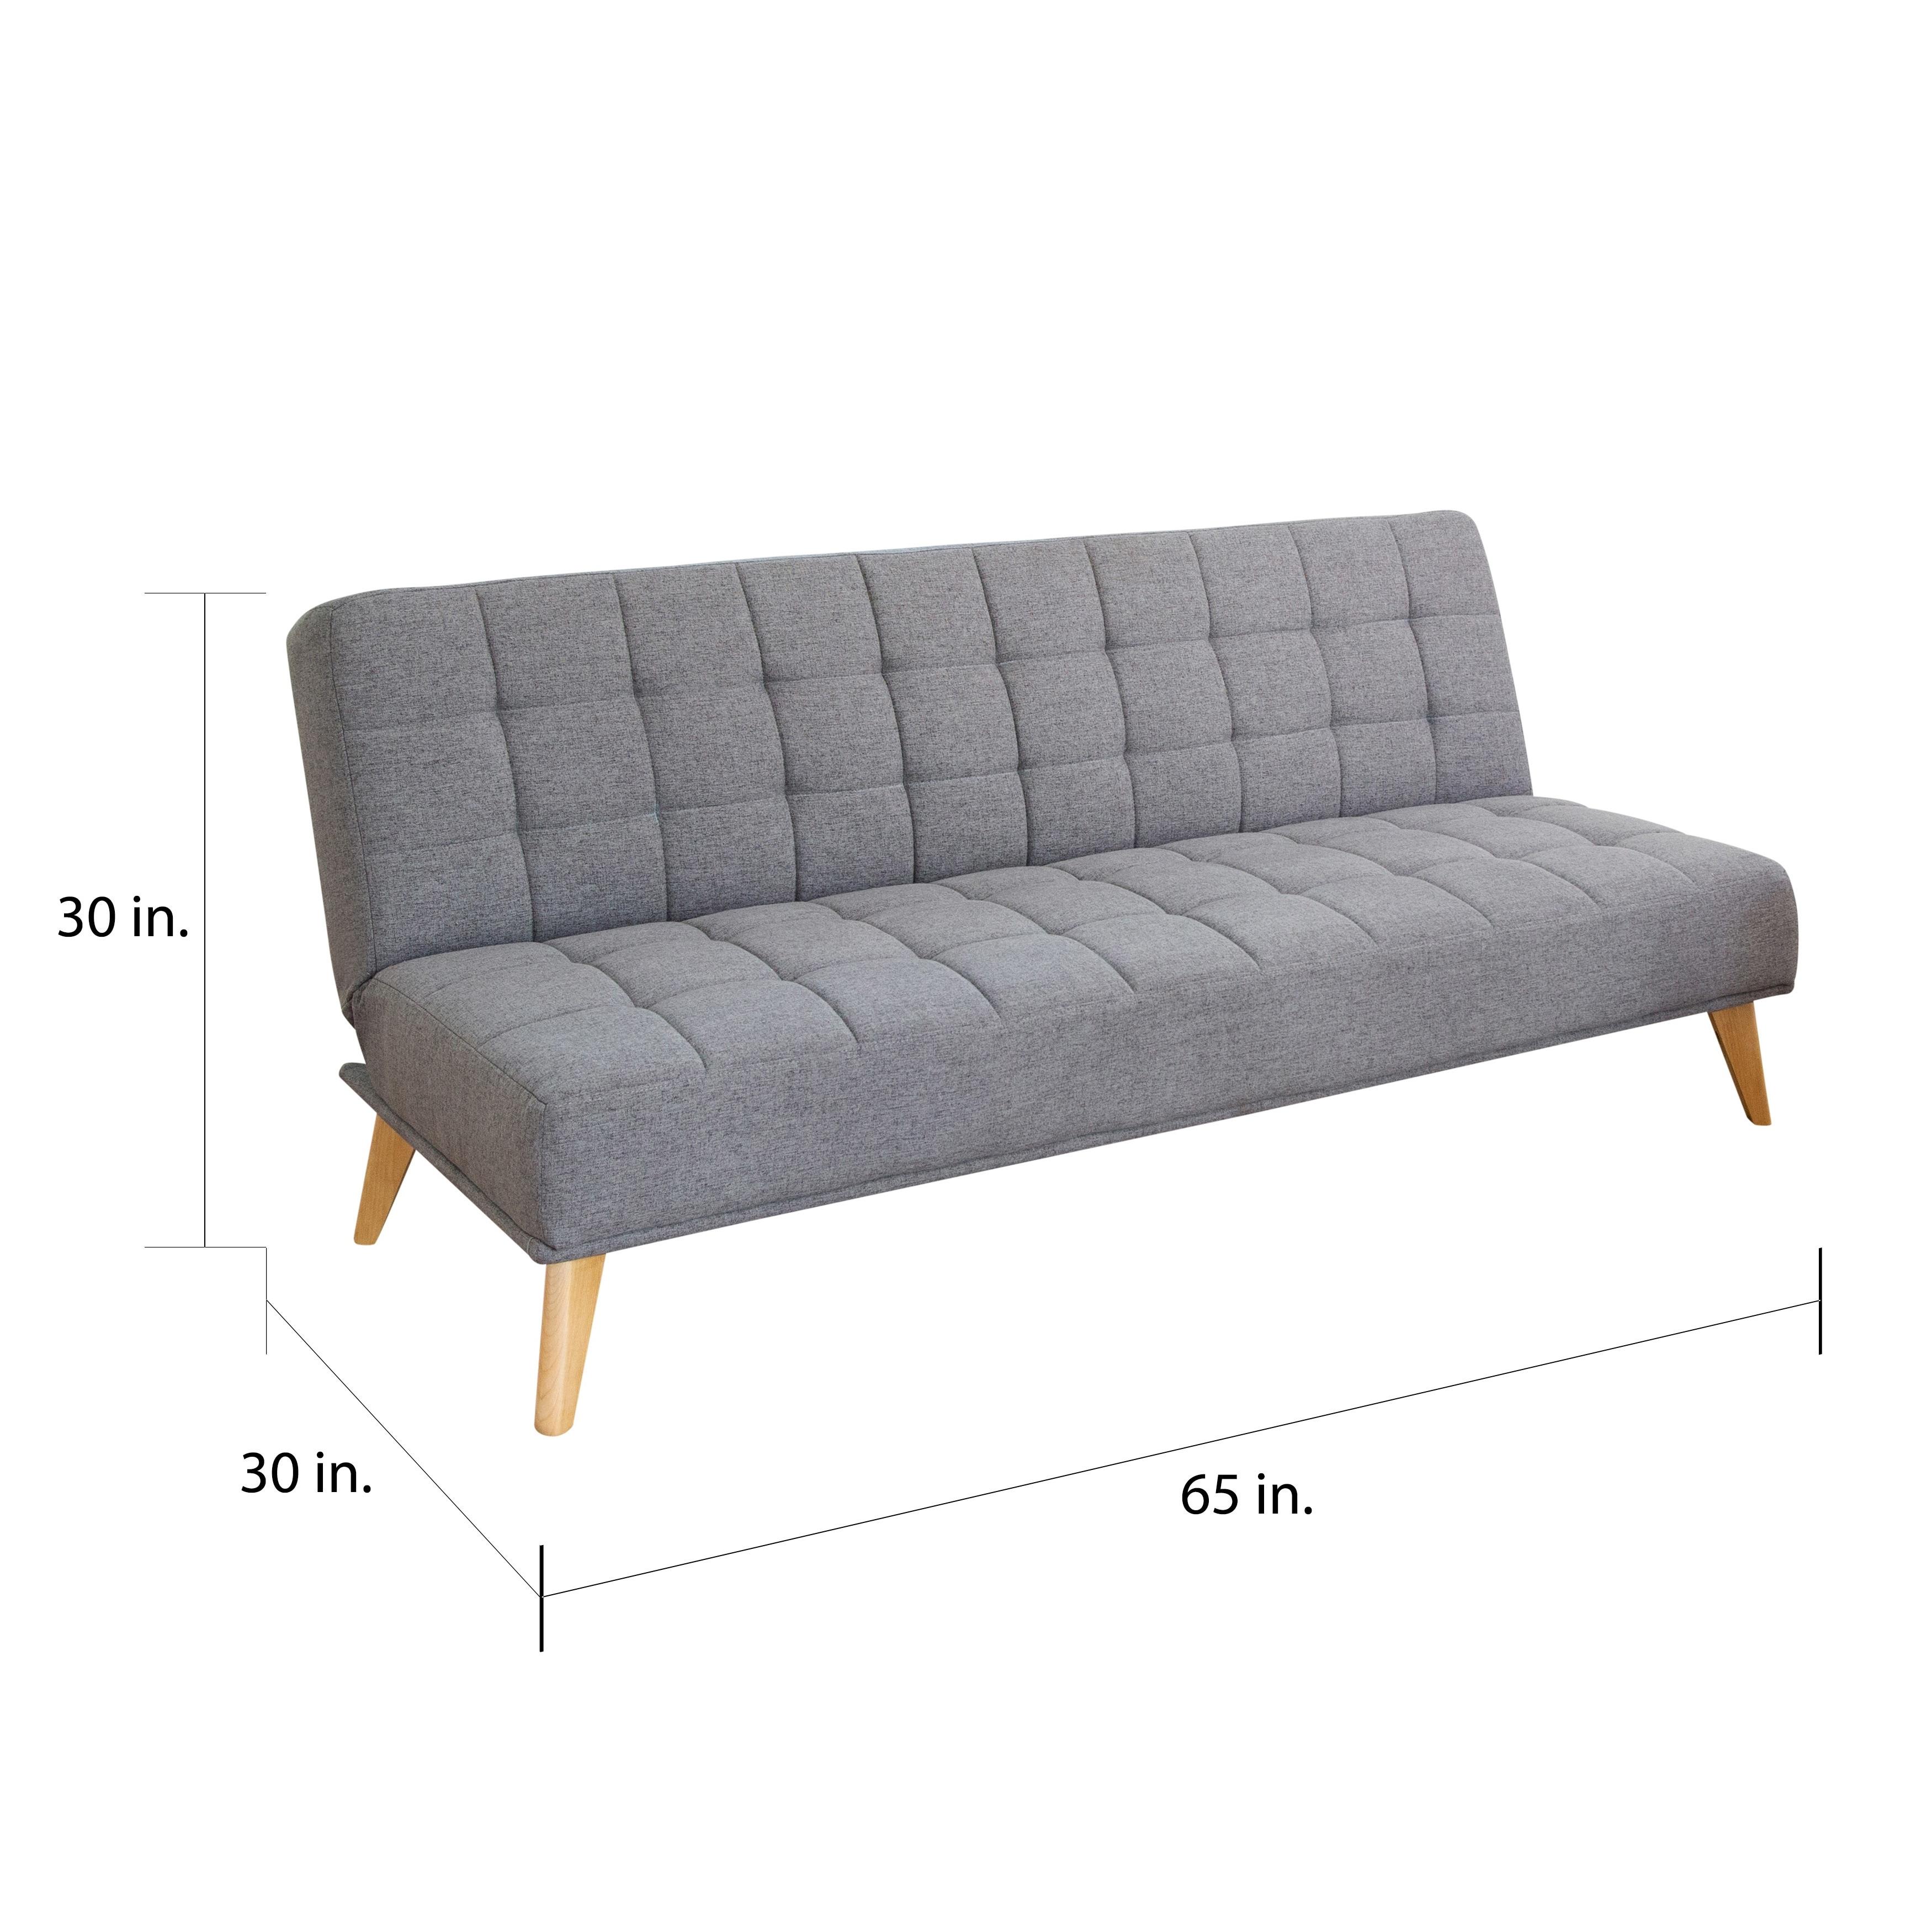 Fabric Tufted Convertible Futon